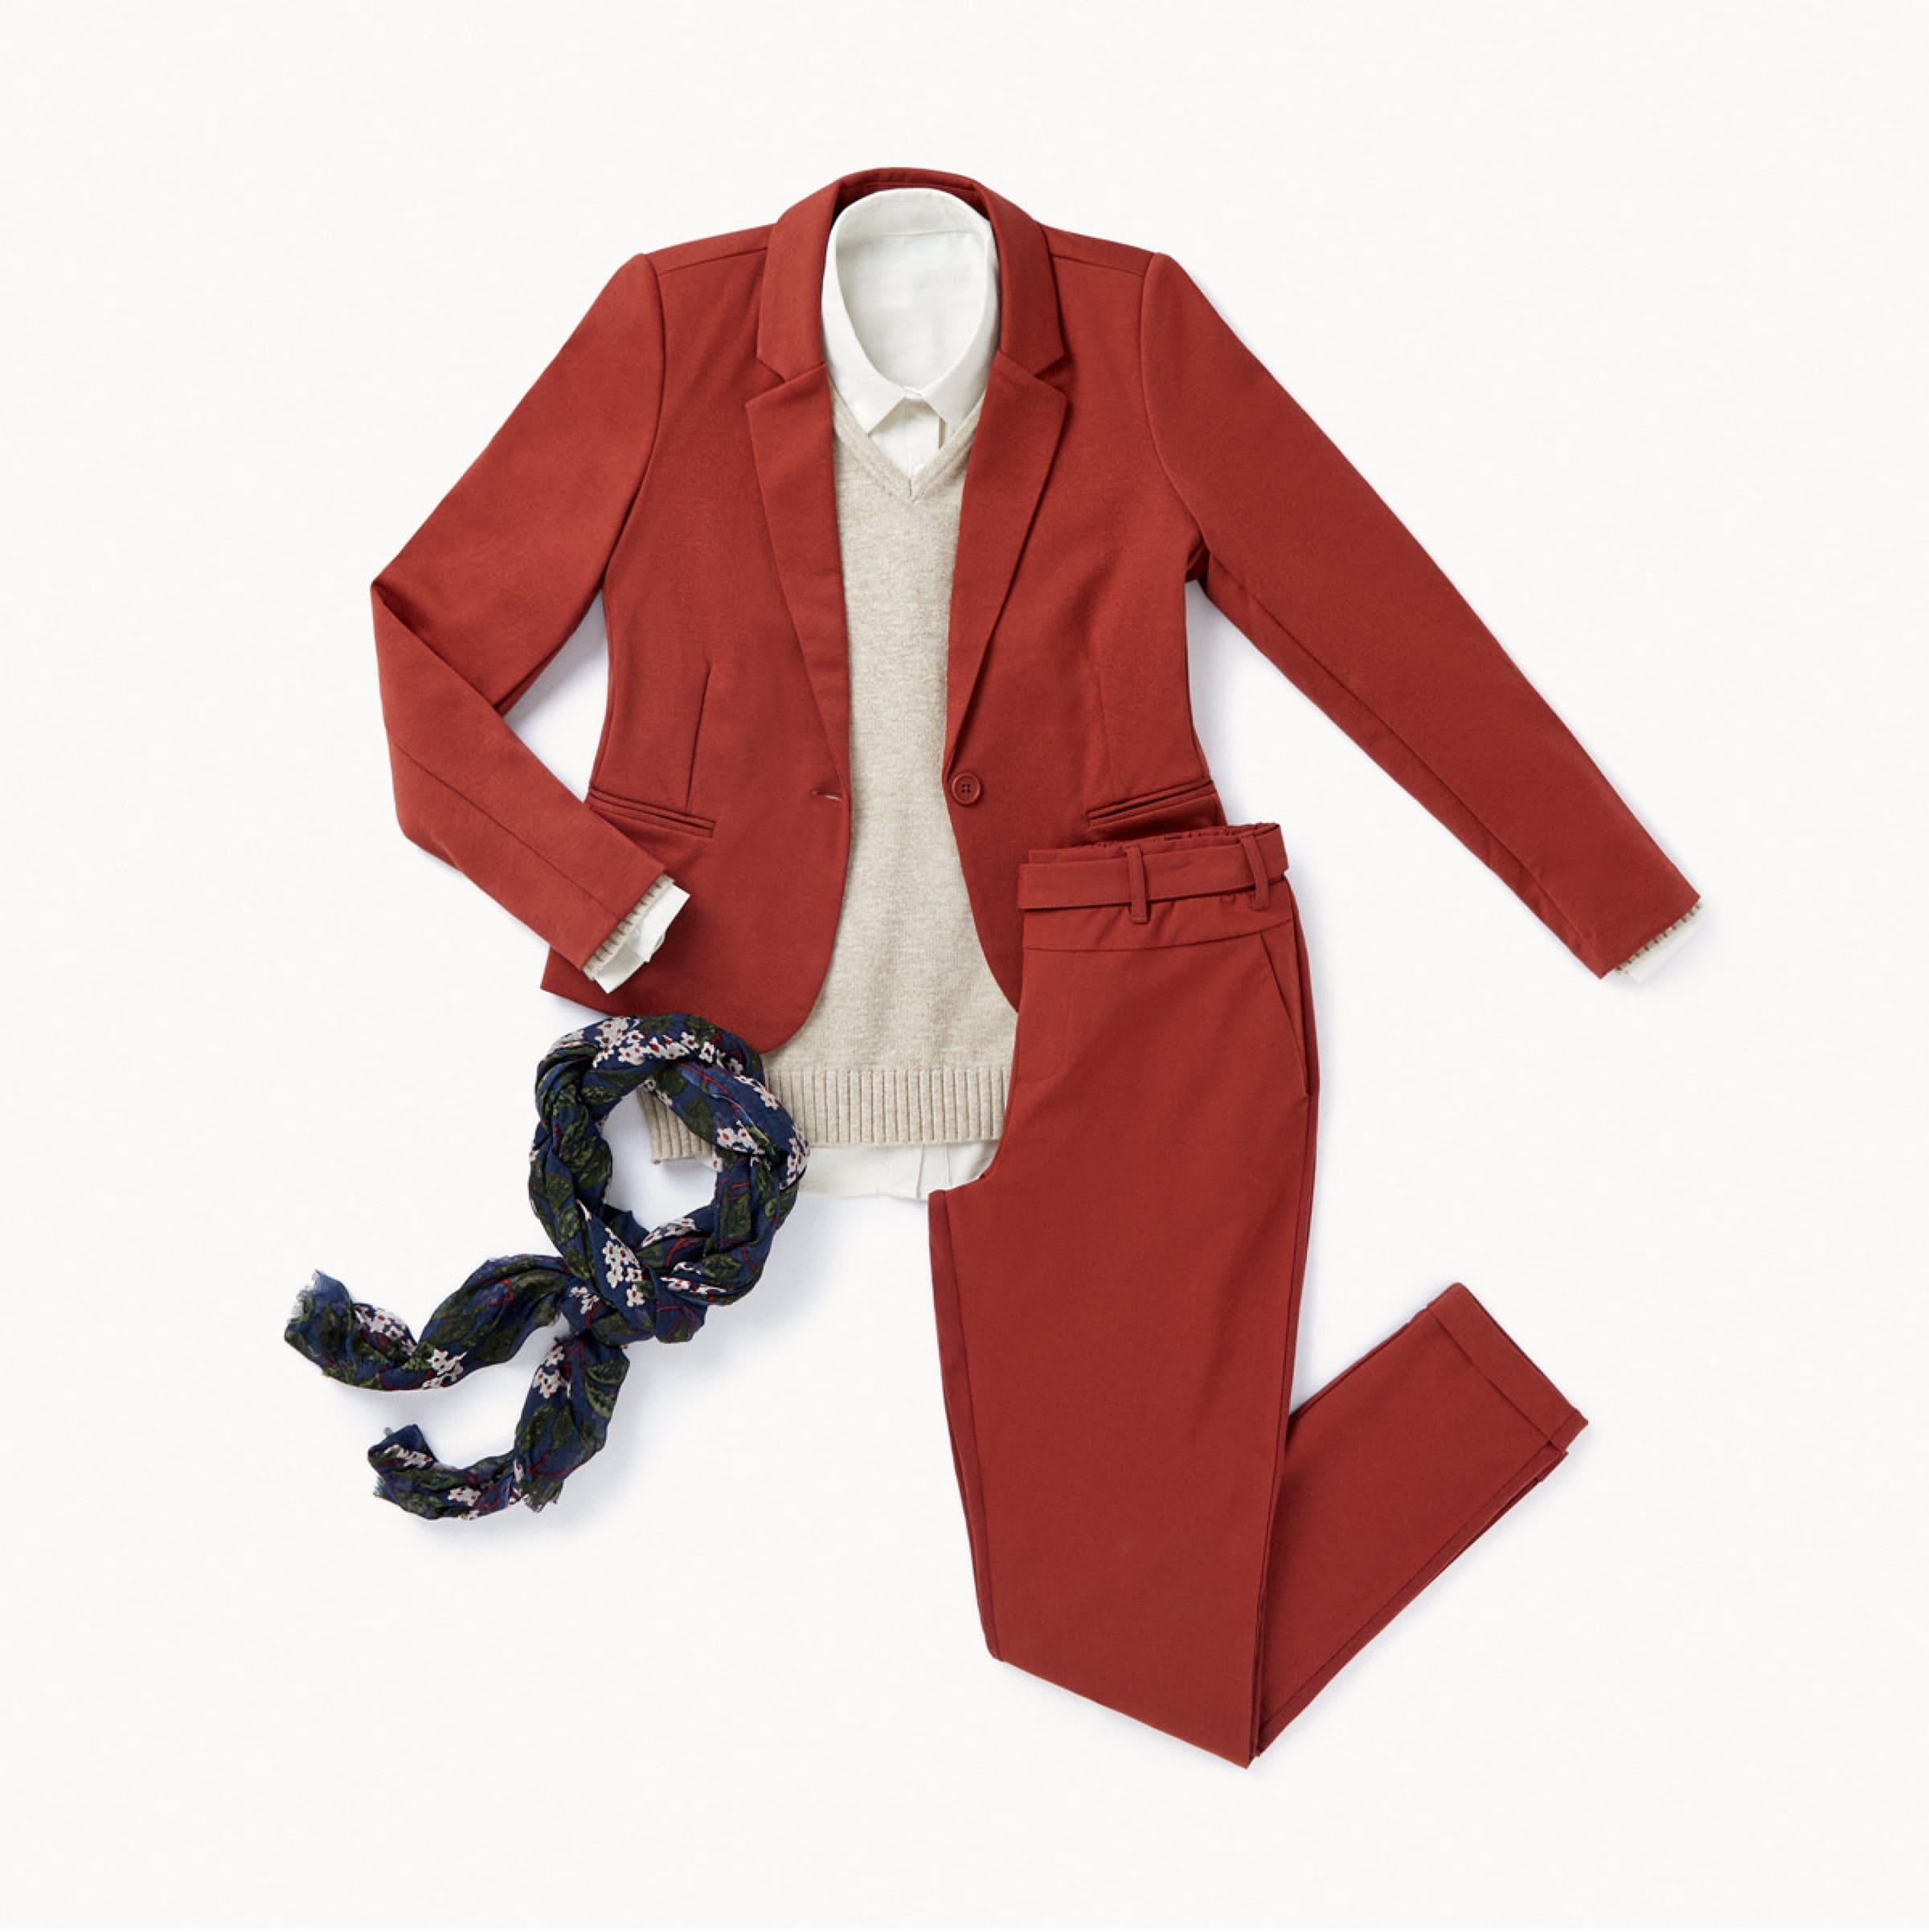 traje de chaqueta color teja oficina outfit